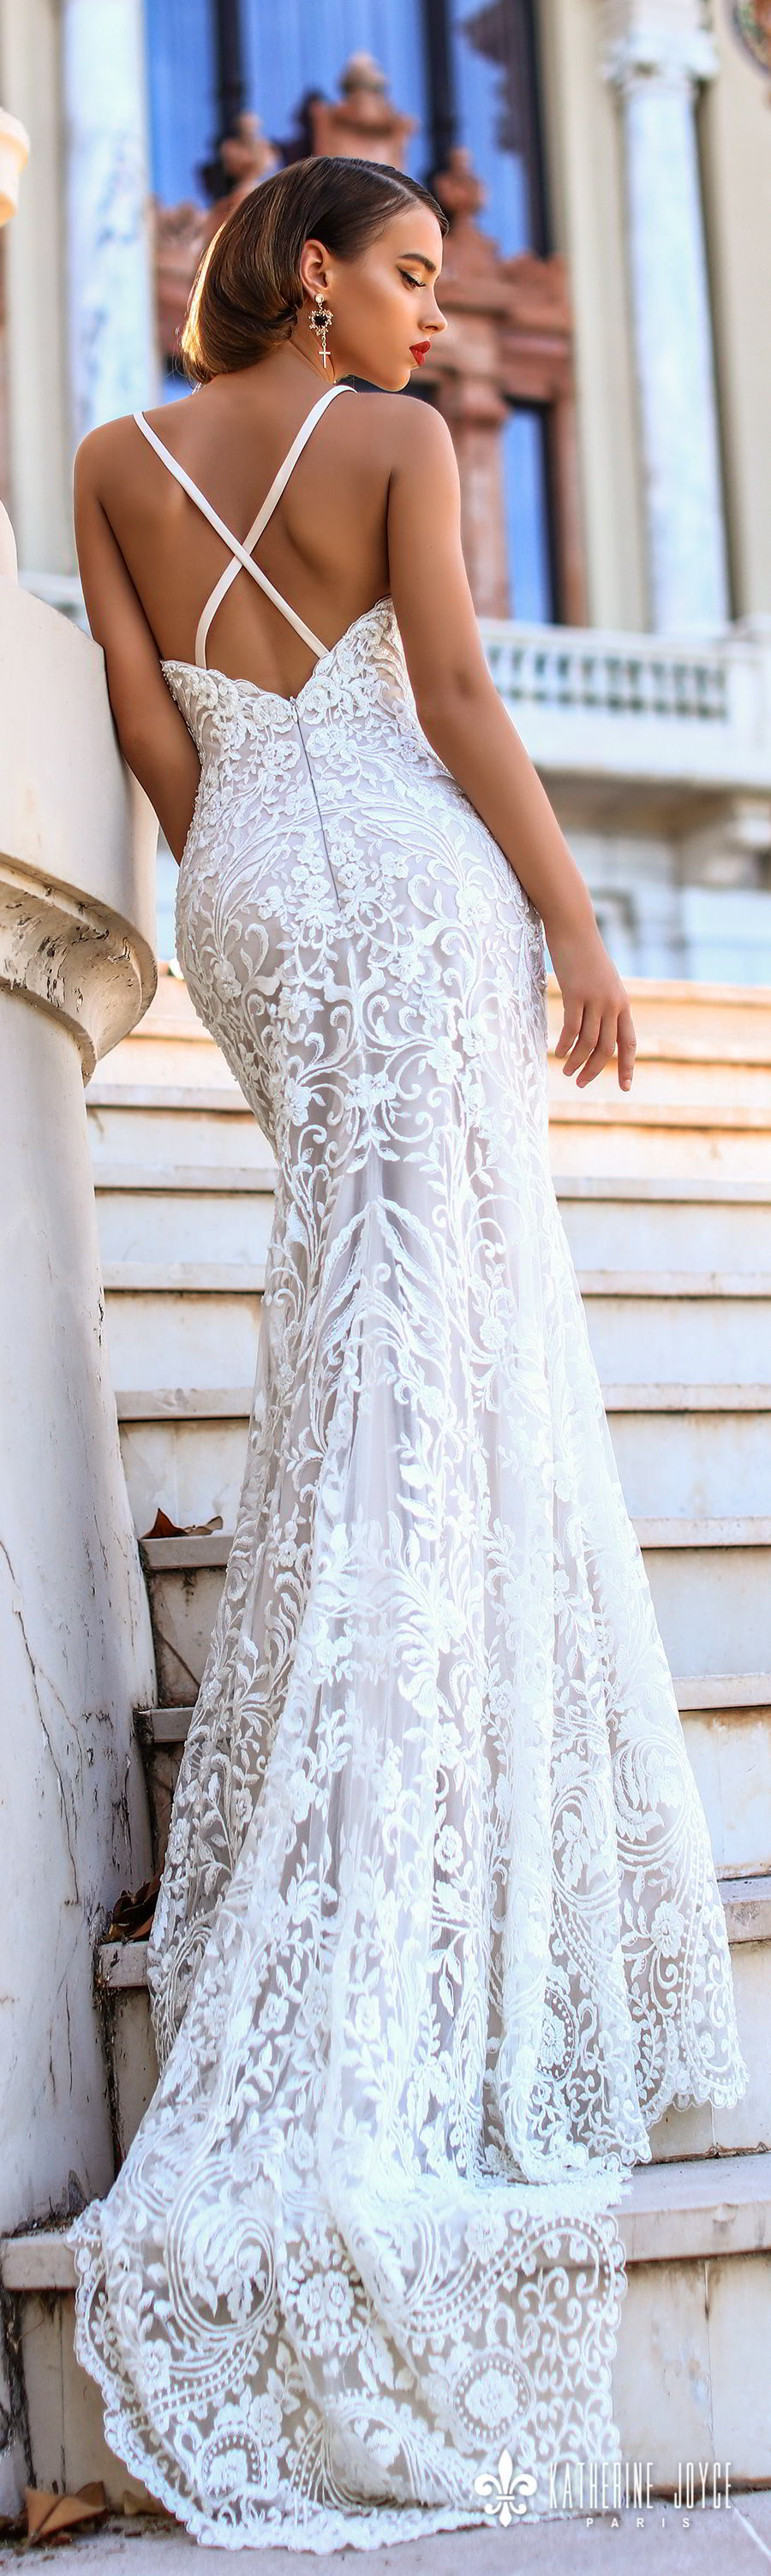 katherine joyce 2018 bridal sleeveless thin strap sweetheart neckline full embellishment elegant sheath wedding dress cross strap back sweep train (kendall) bv